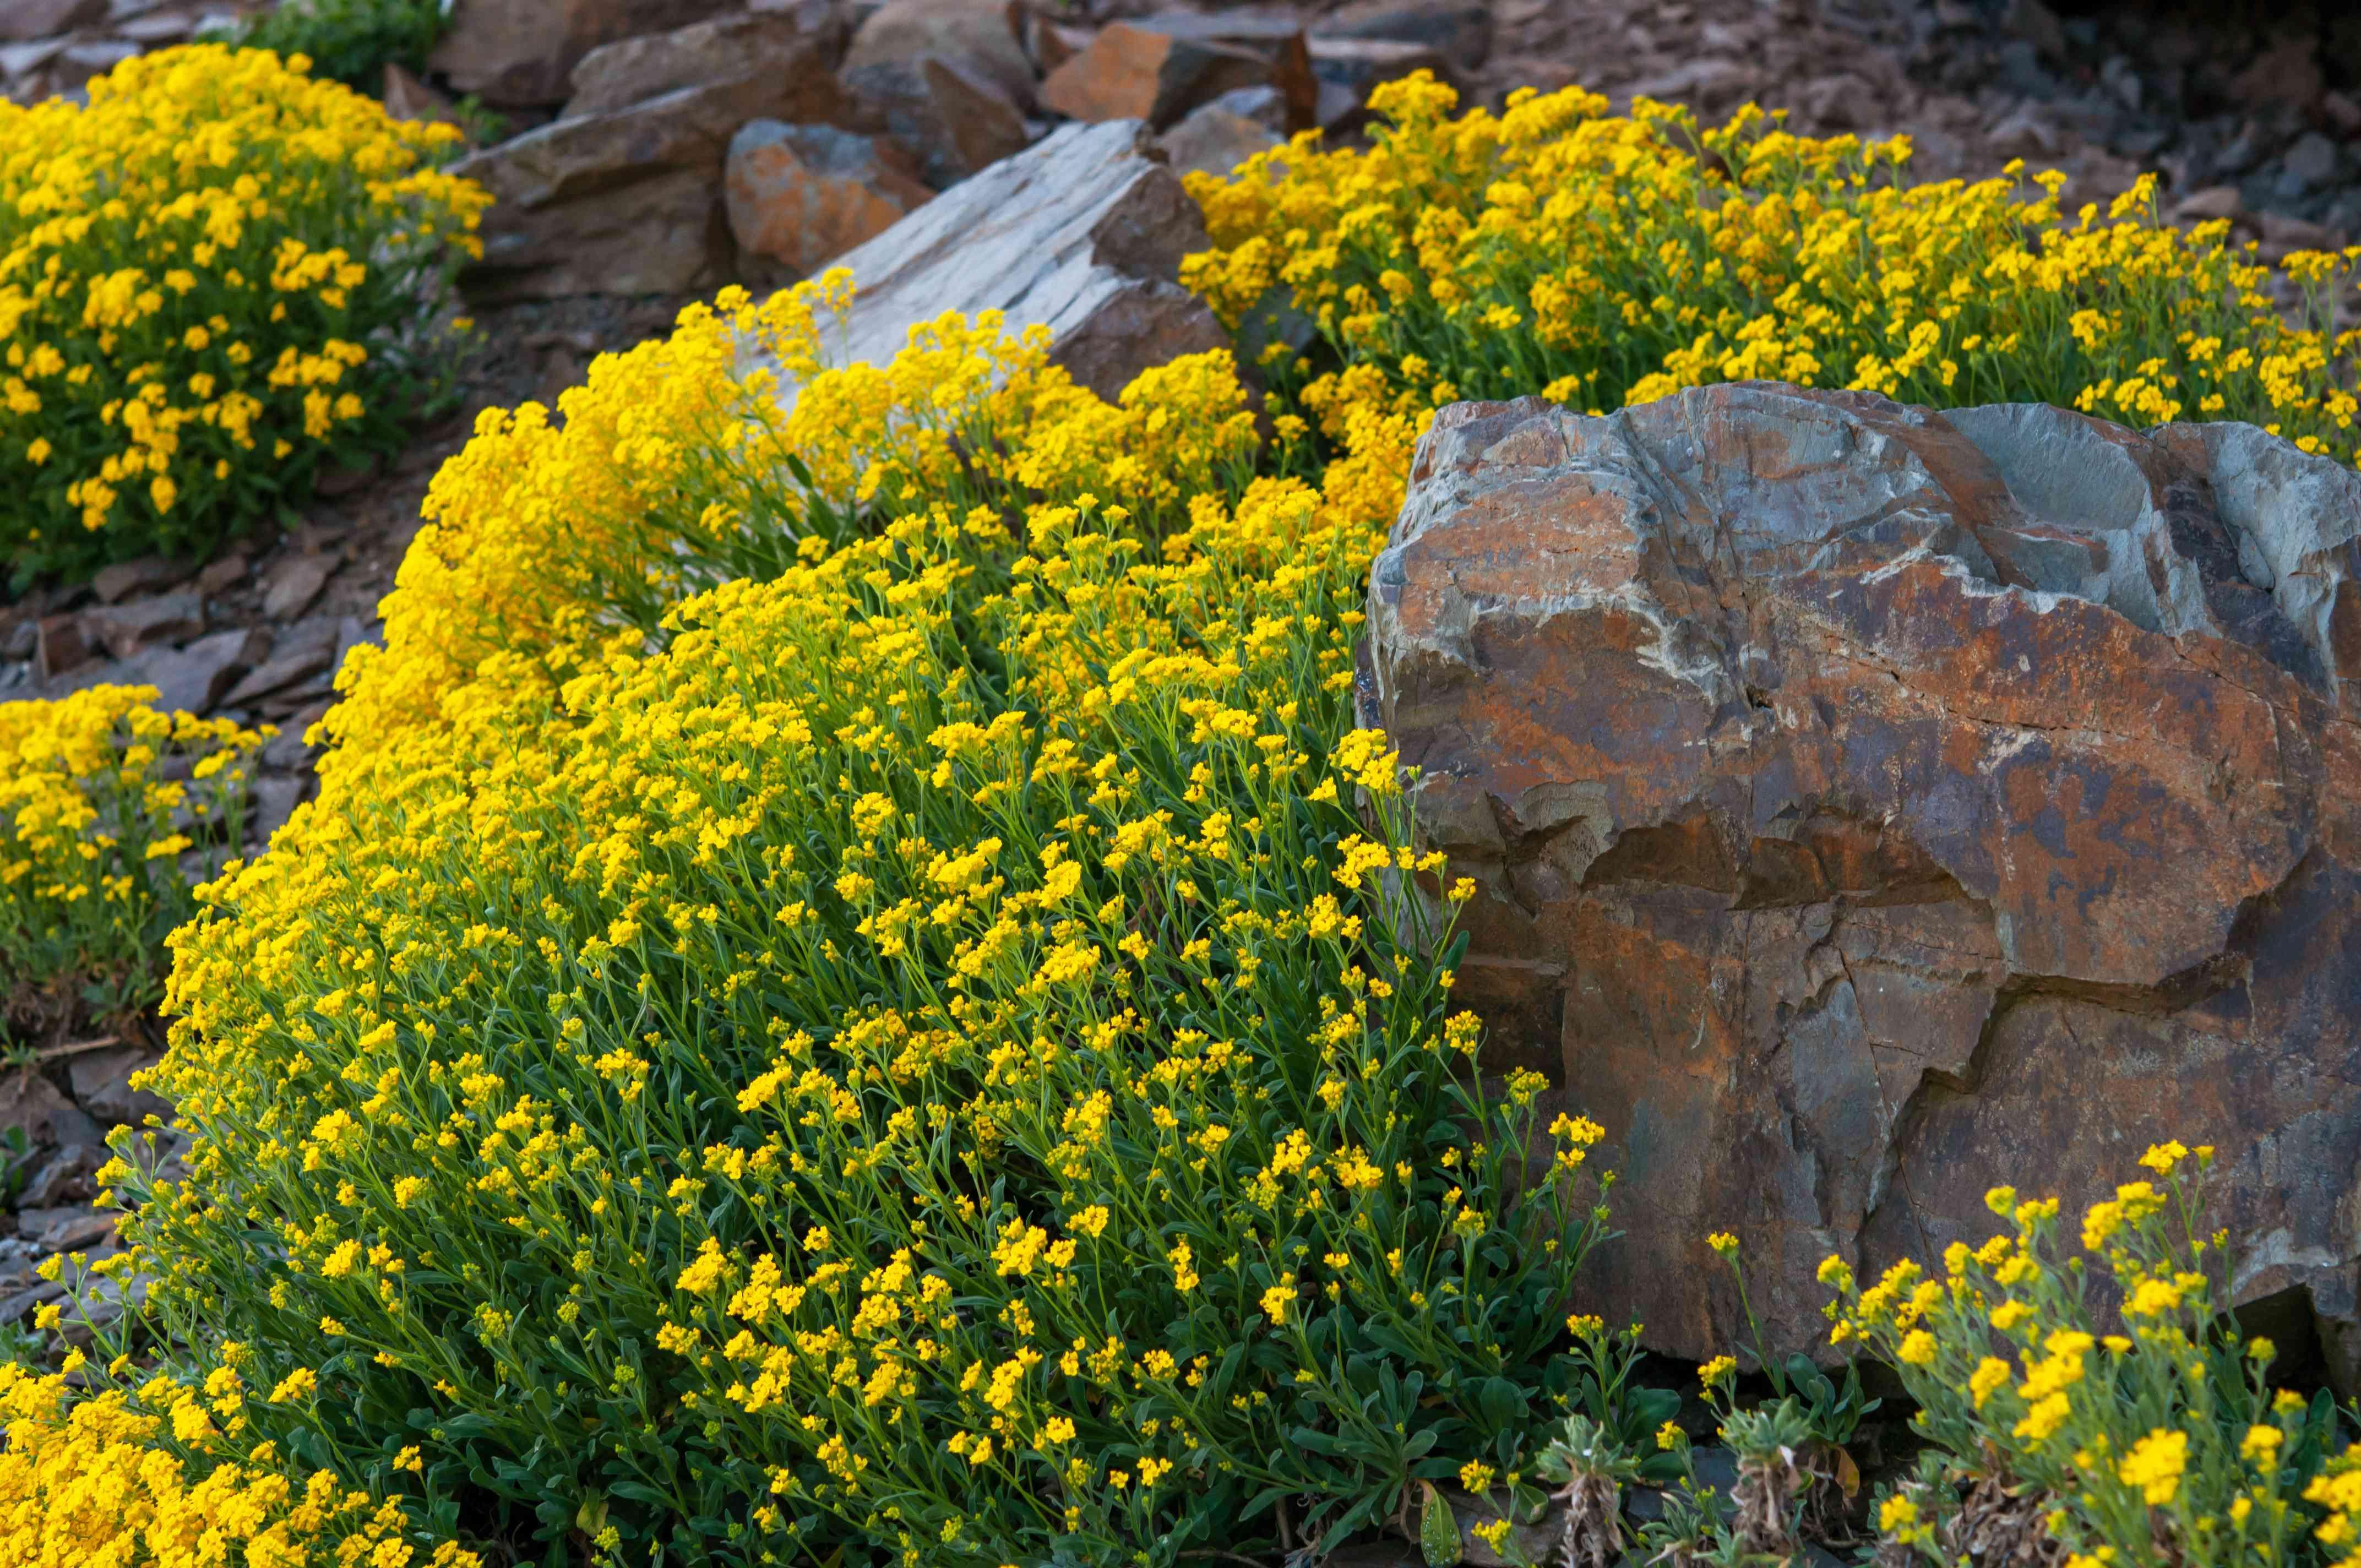 yellow alyssum growing around rocks